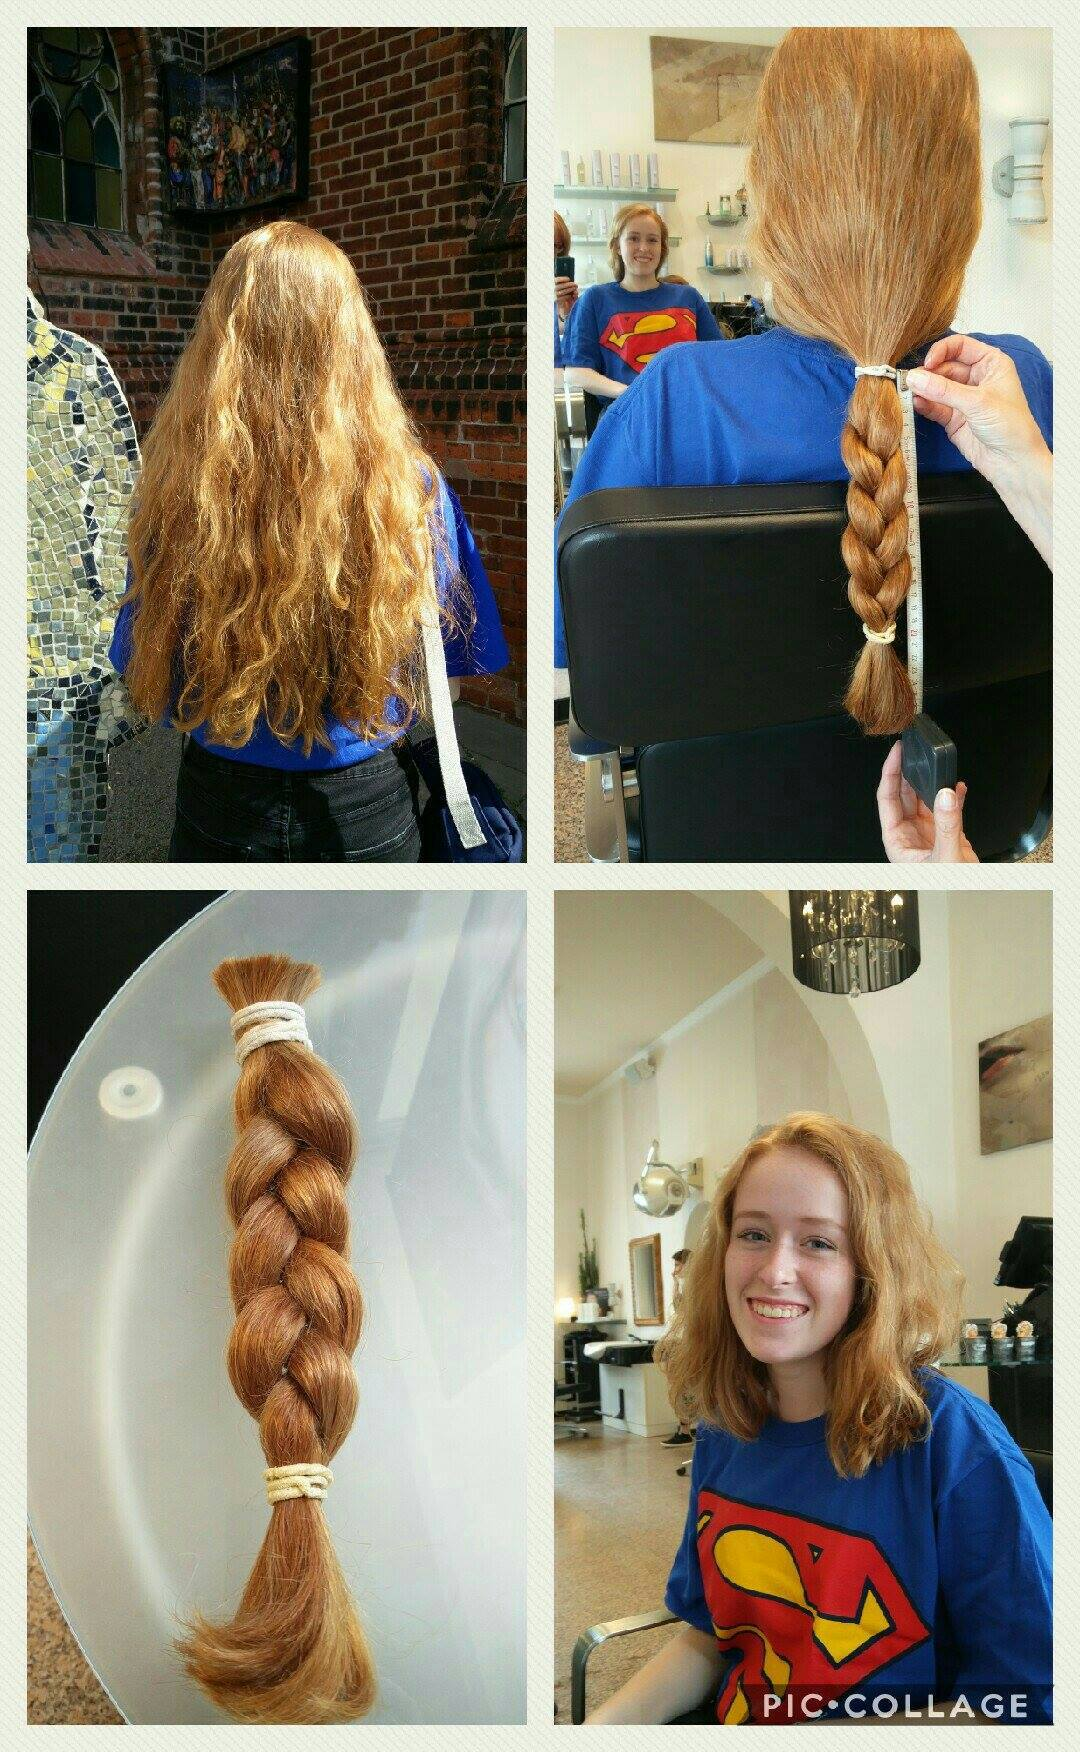 Haare spenden_Jettes Haarspende fuer die Krebshilfe